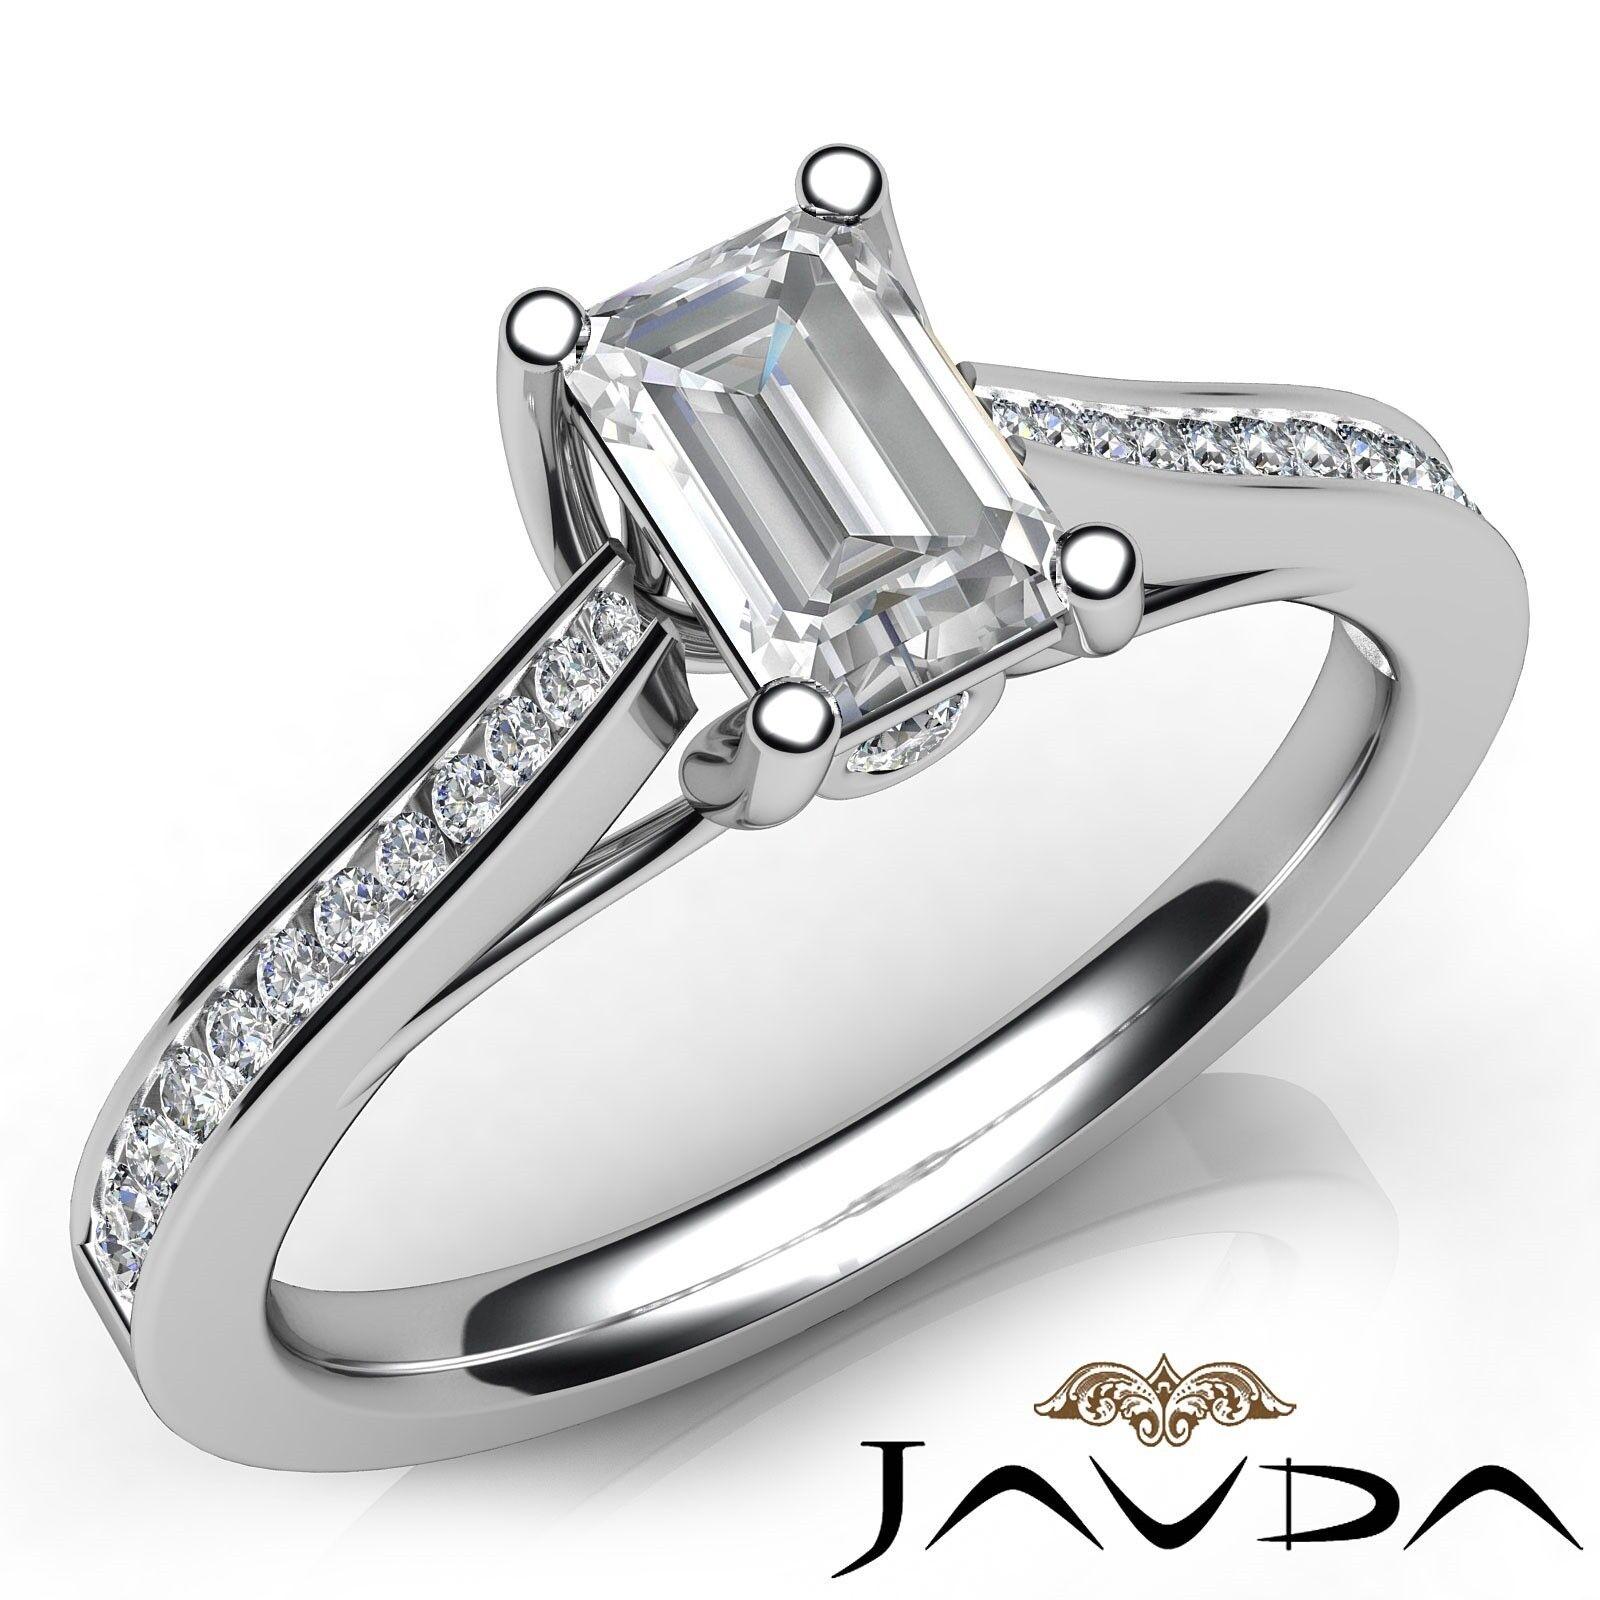 1.32ctw Channel Set Shank Emerald Diamond Engagement Ring GIA F-VVS2 White Gold